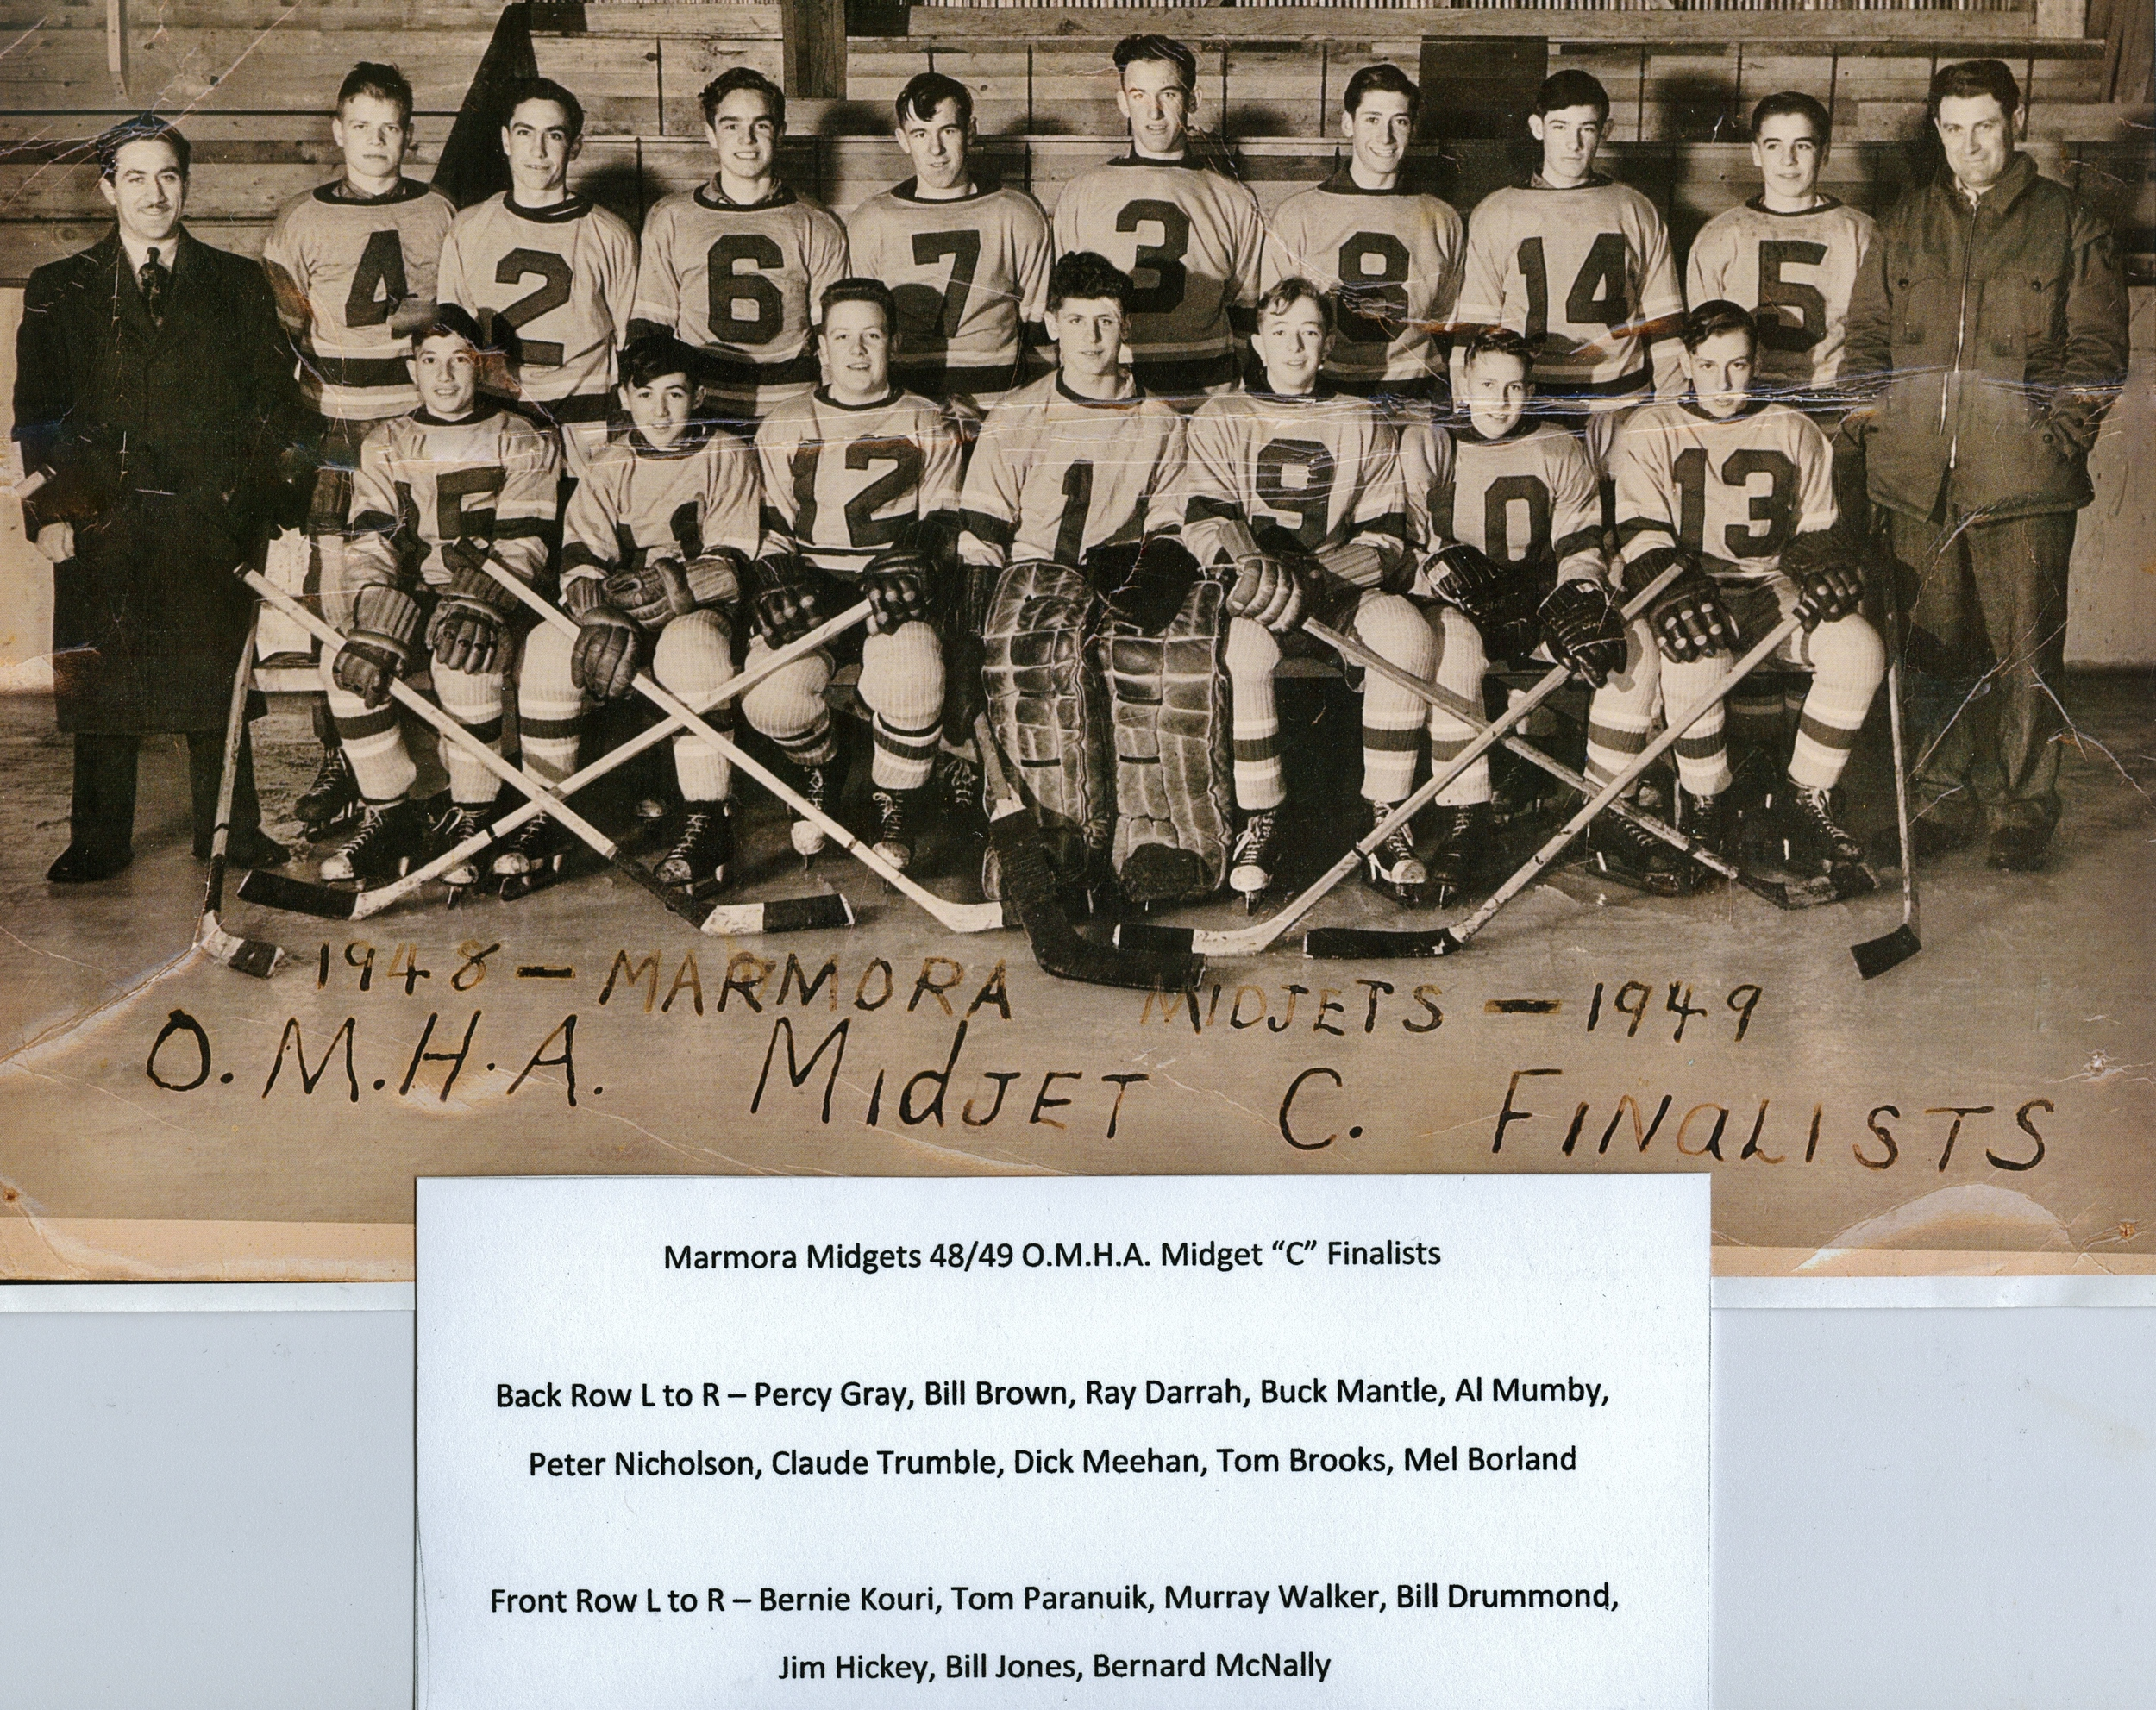 Midget C Finalists 1948-49